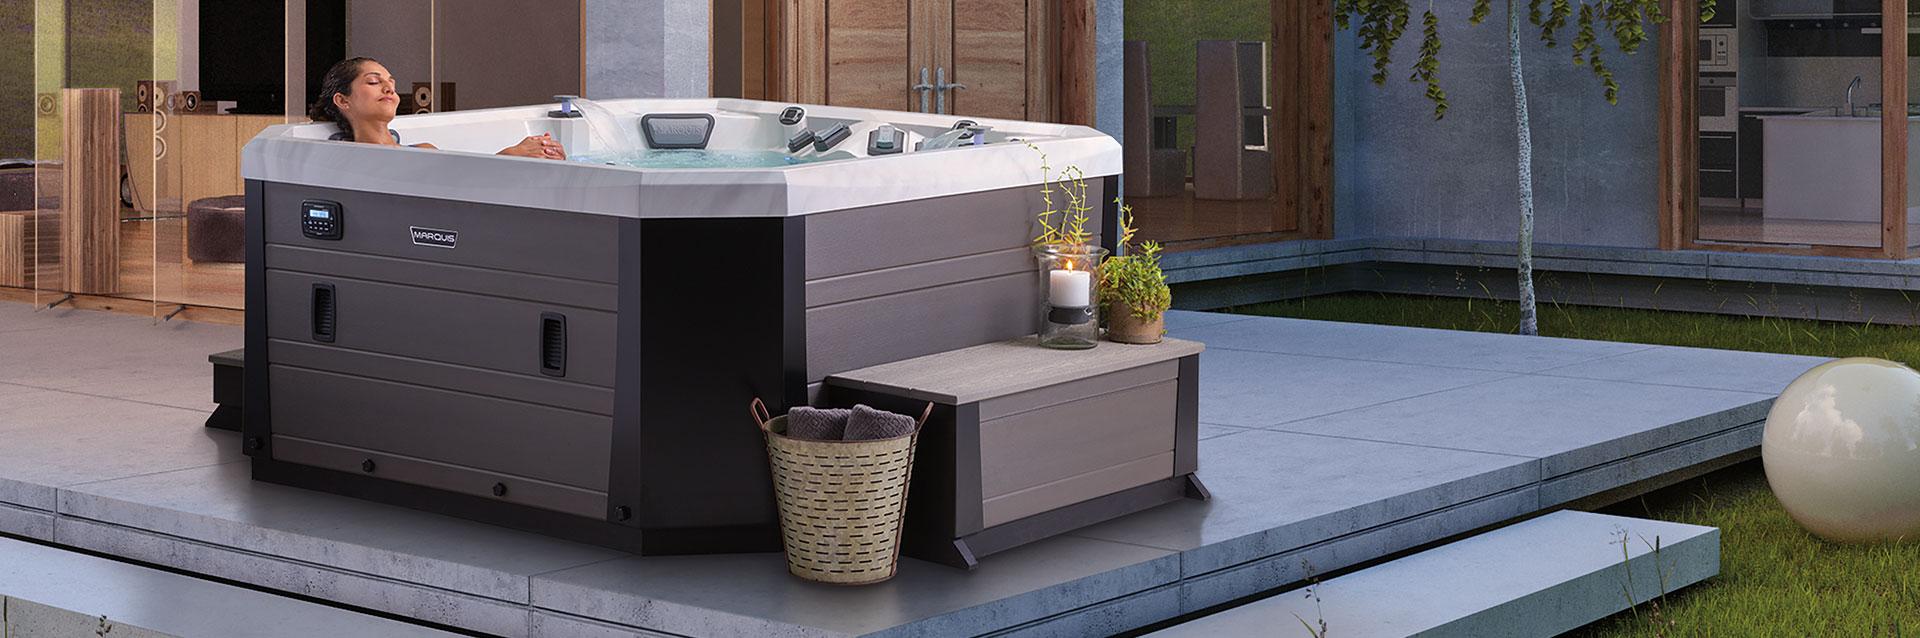 v77l hot tub in New Jersey